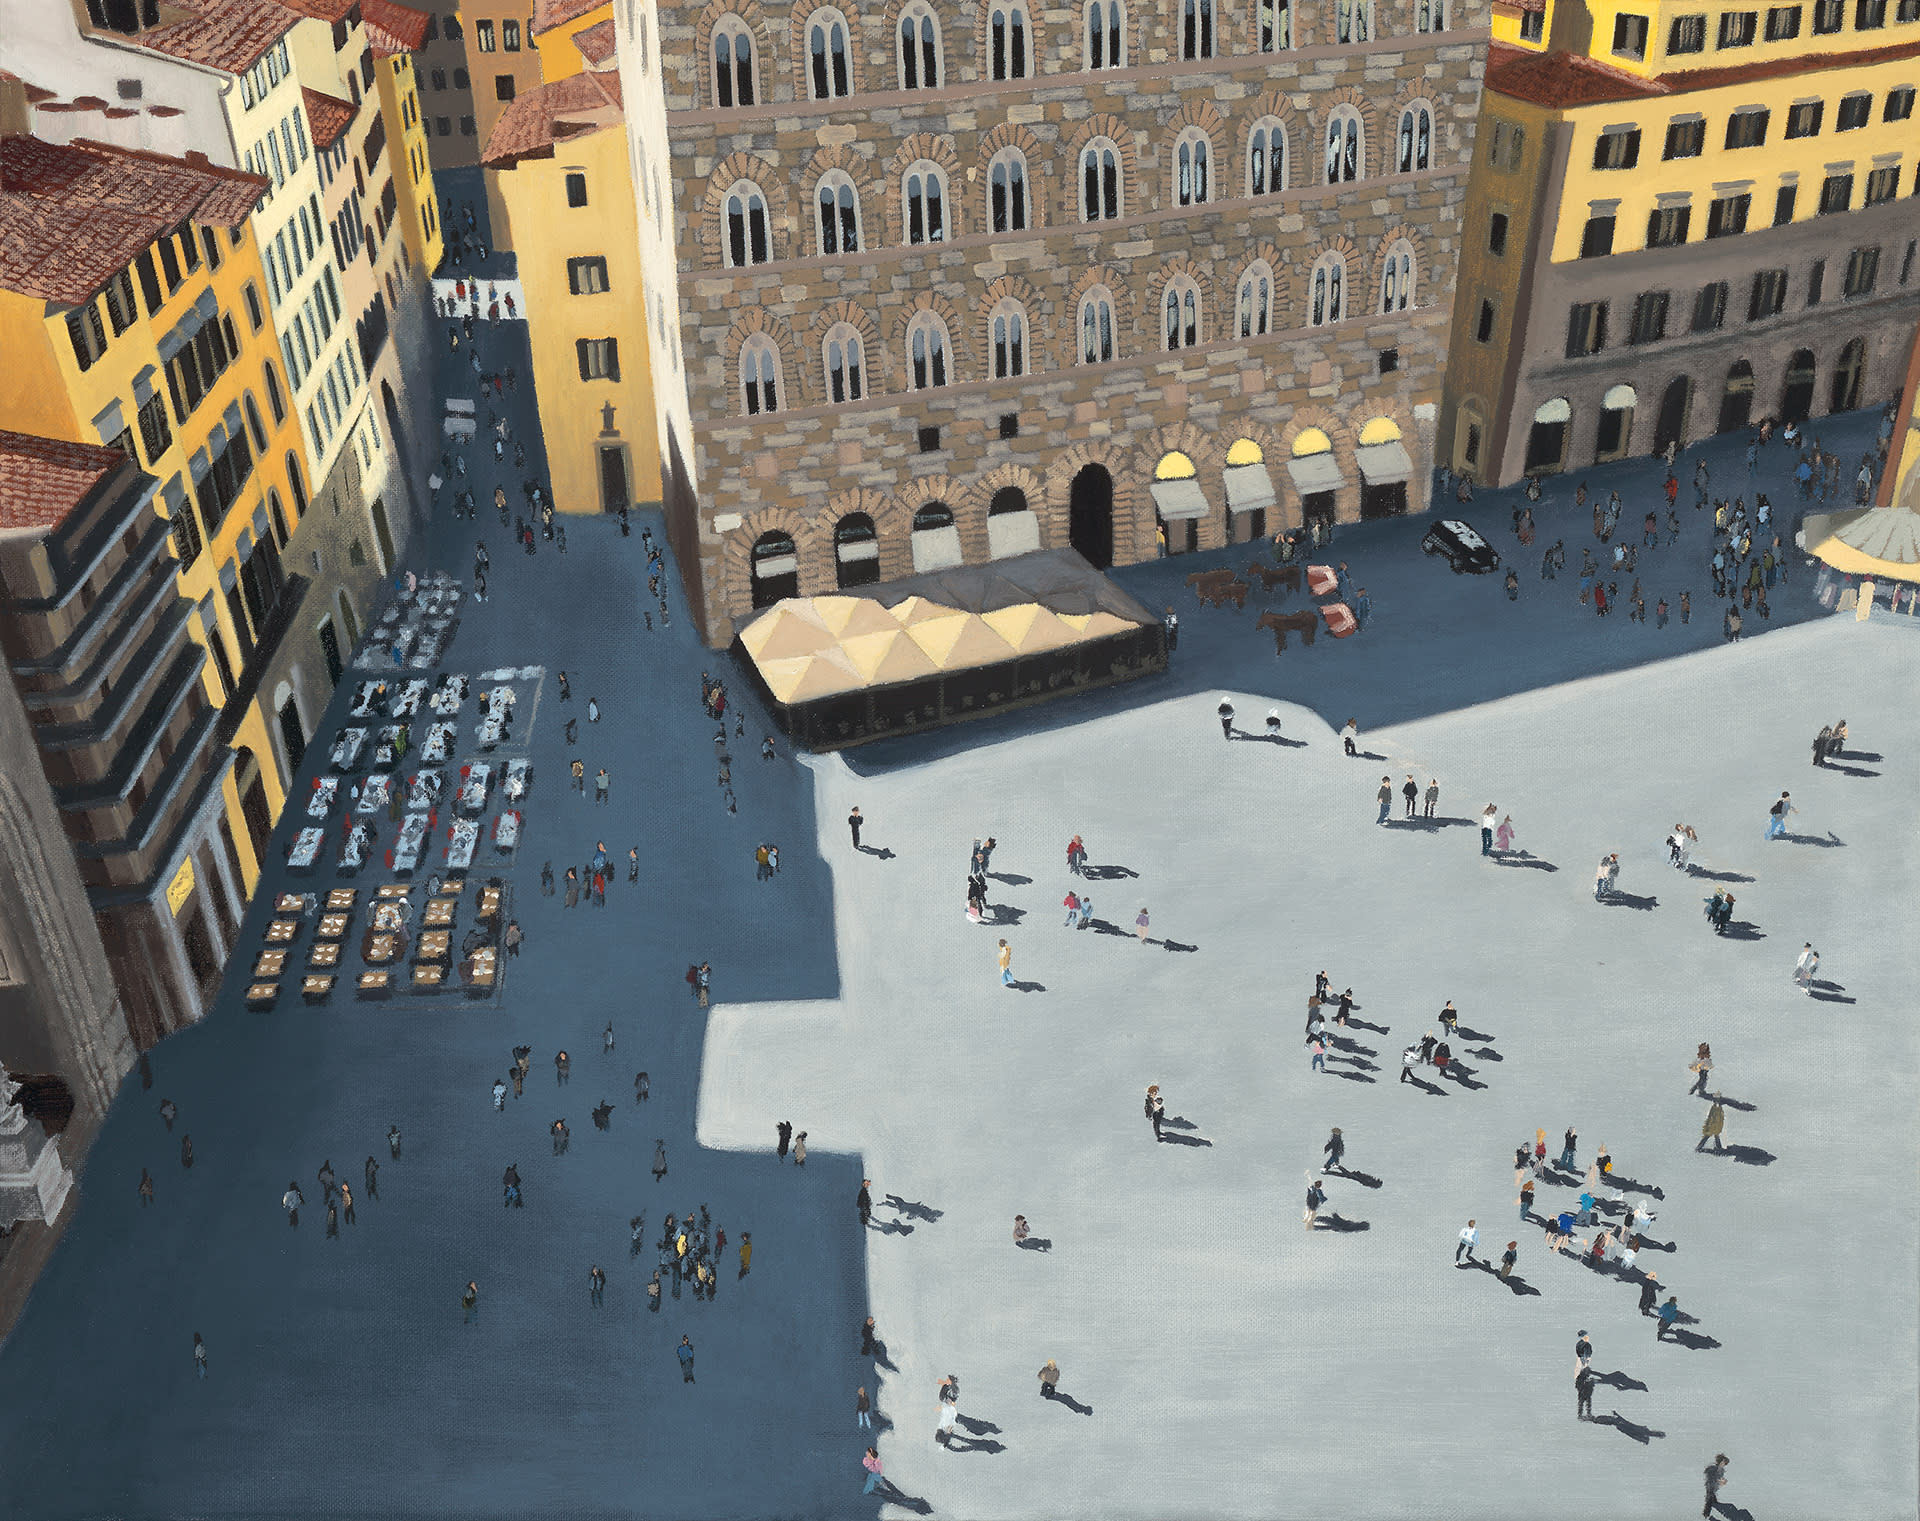 Piazza signoria florence 2020 web sr3ir3